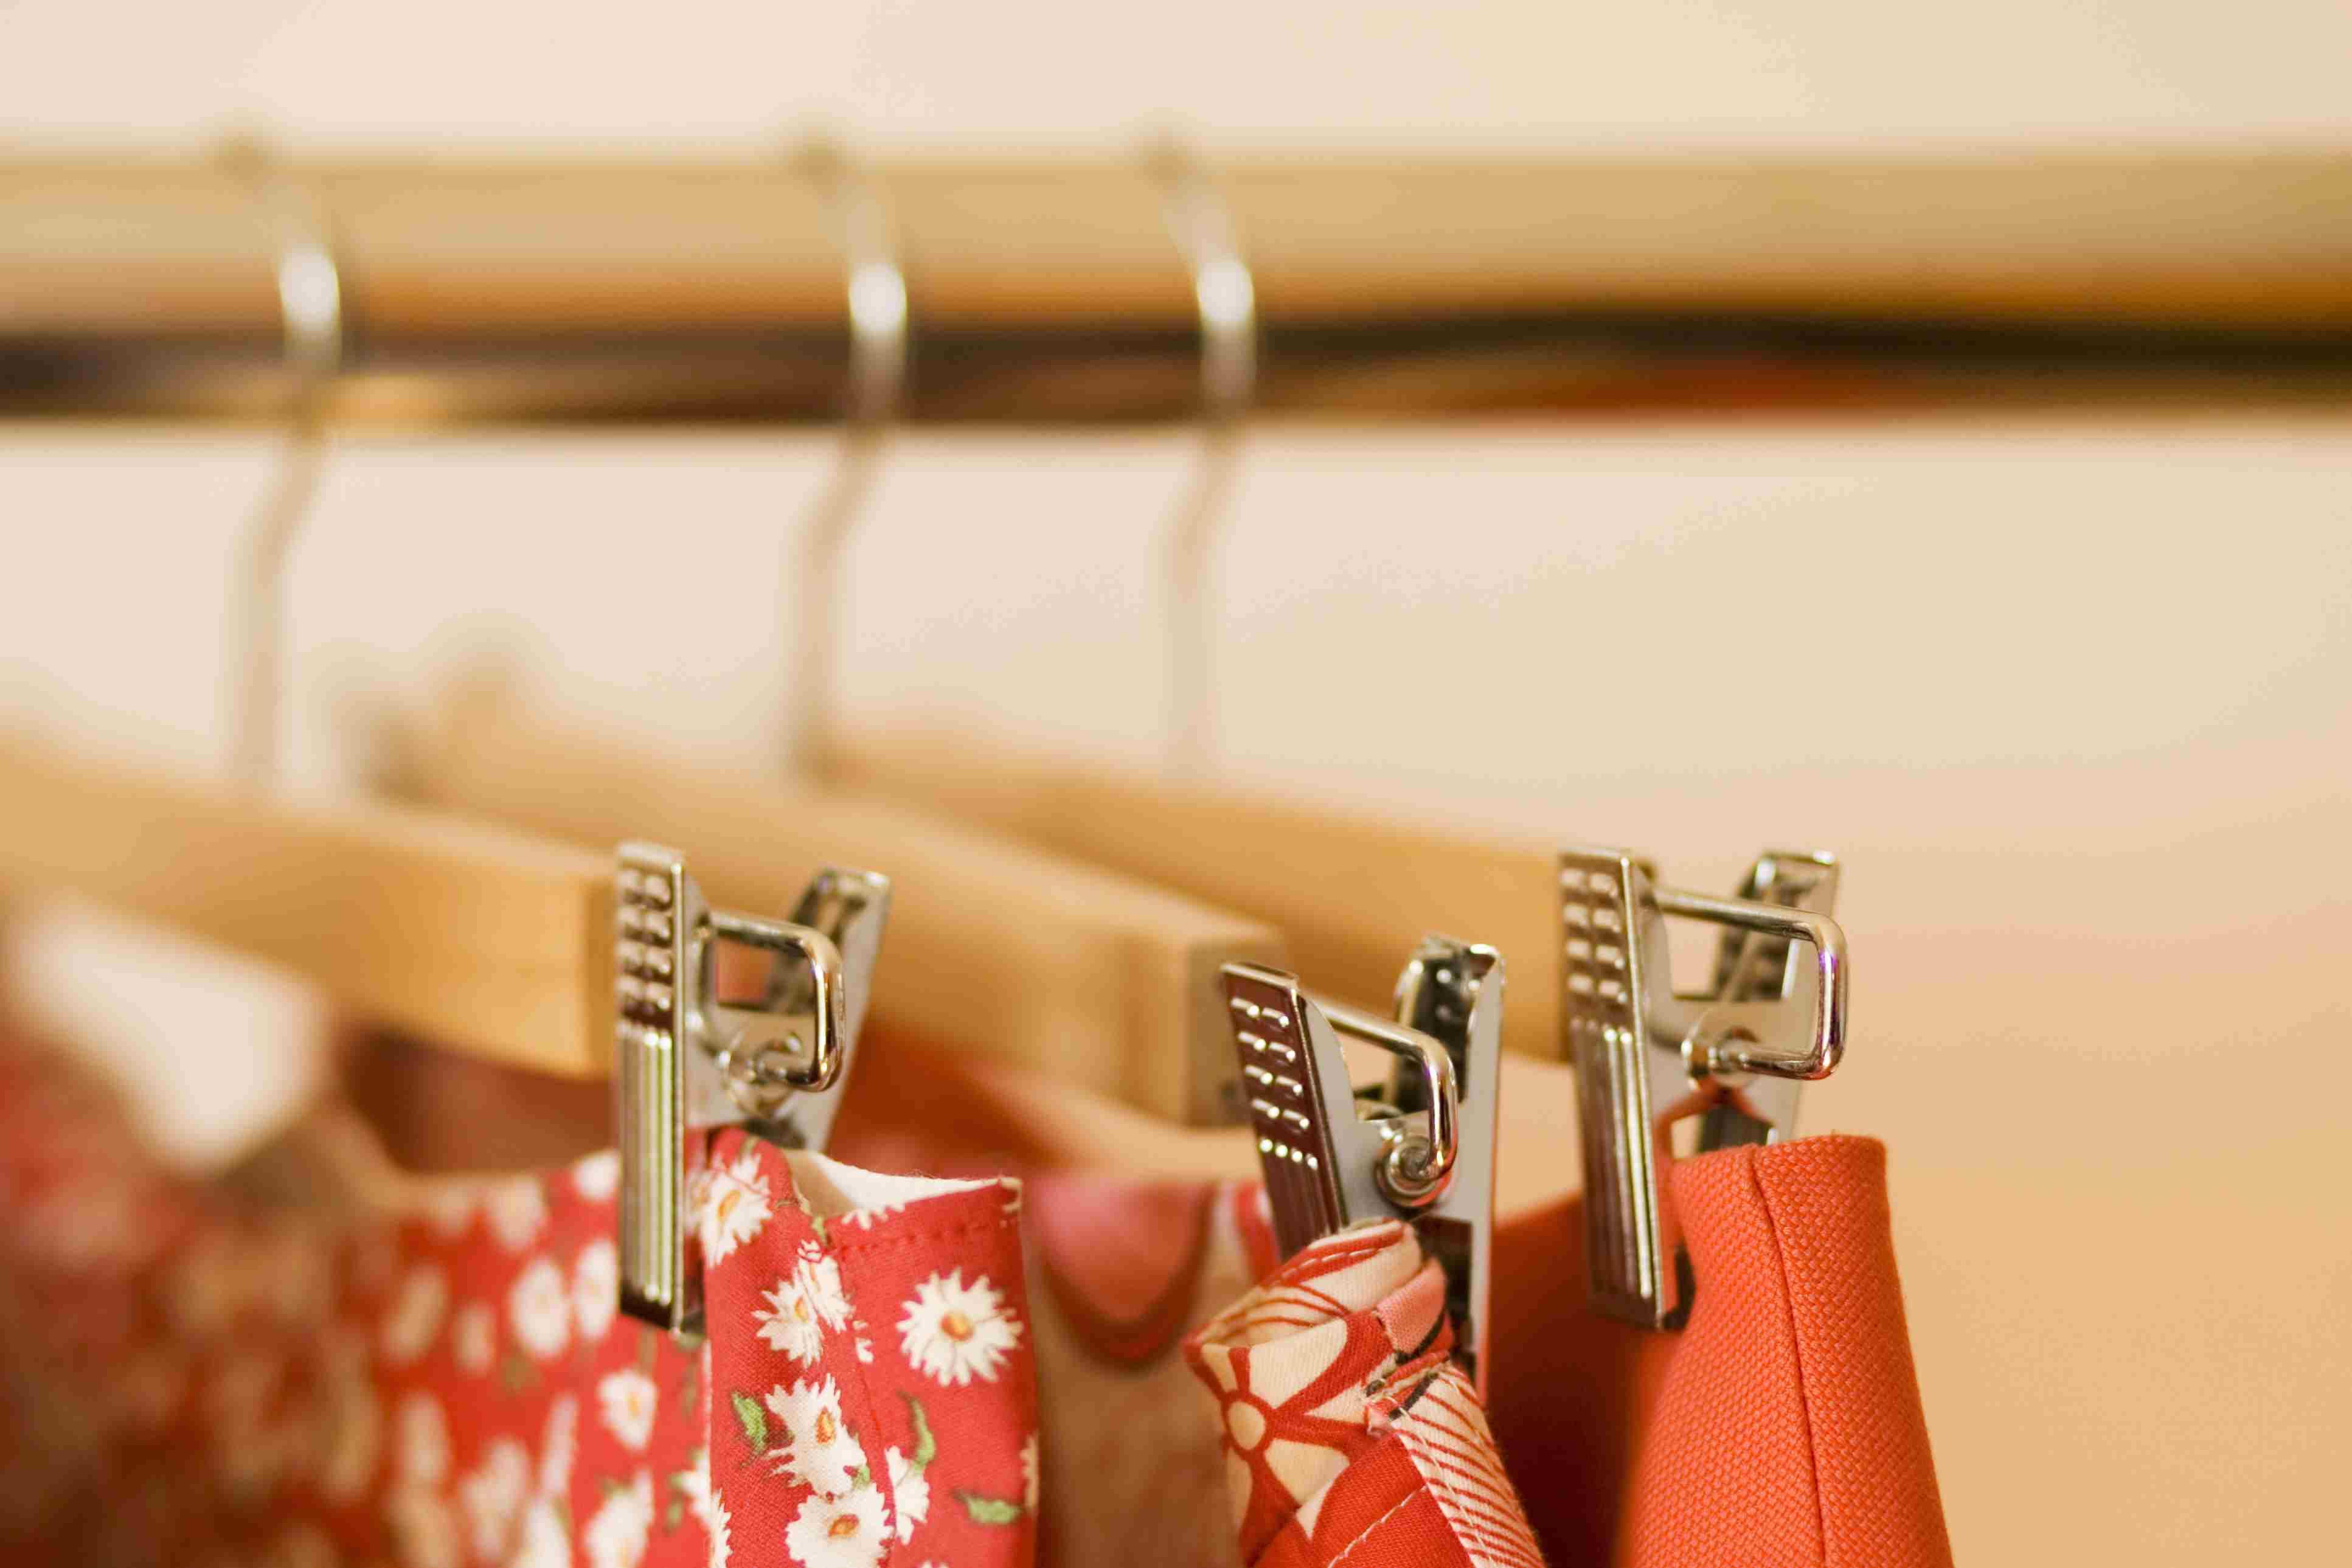 Skirts on a rack